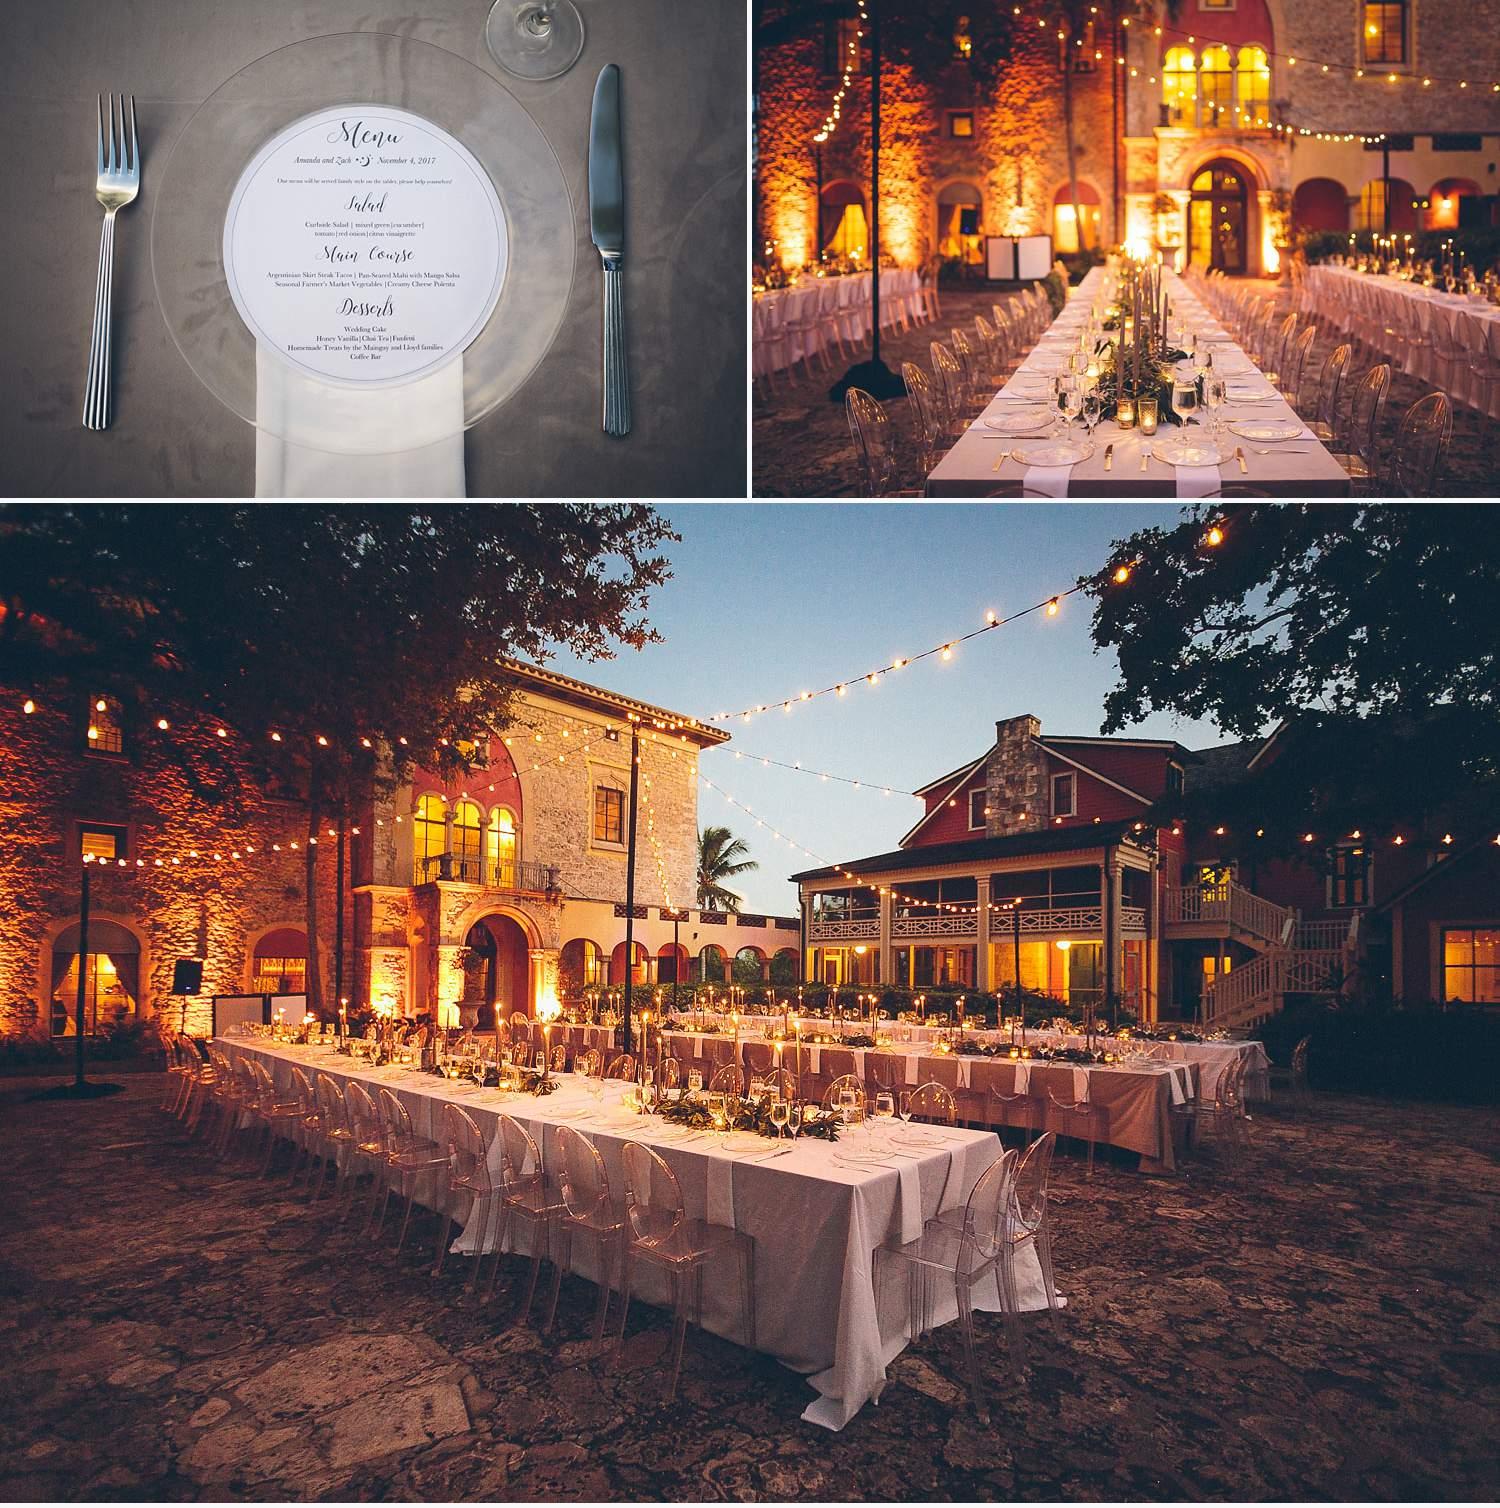 deering-estate-wedding-photographer-daniel-lateulade-023.JPG